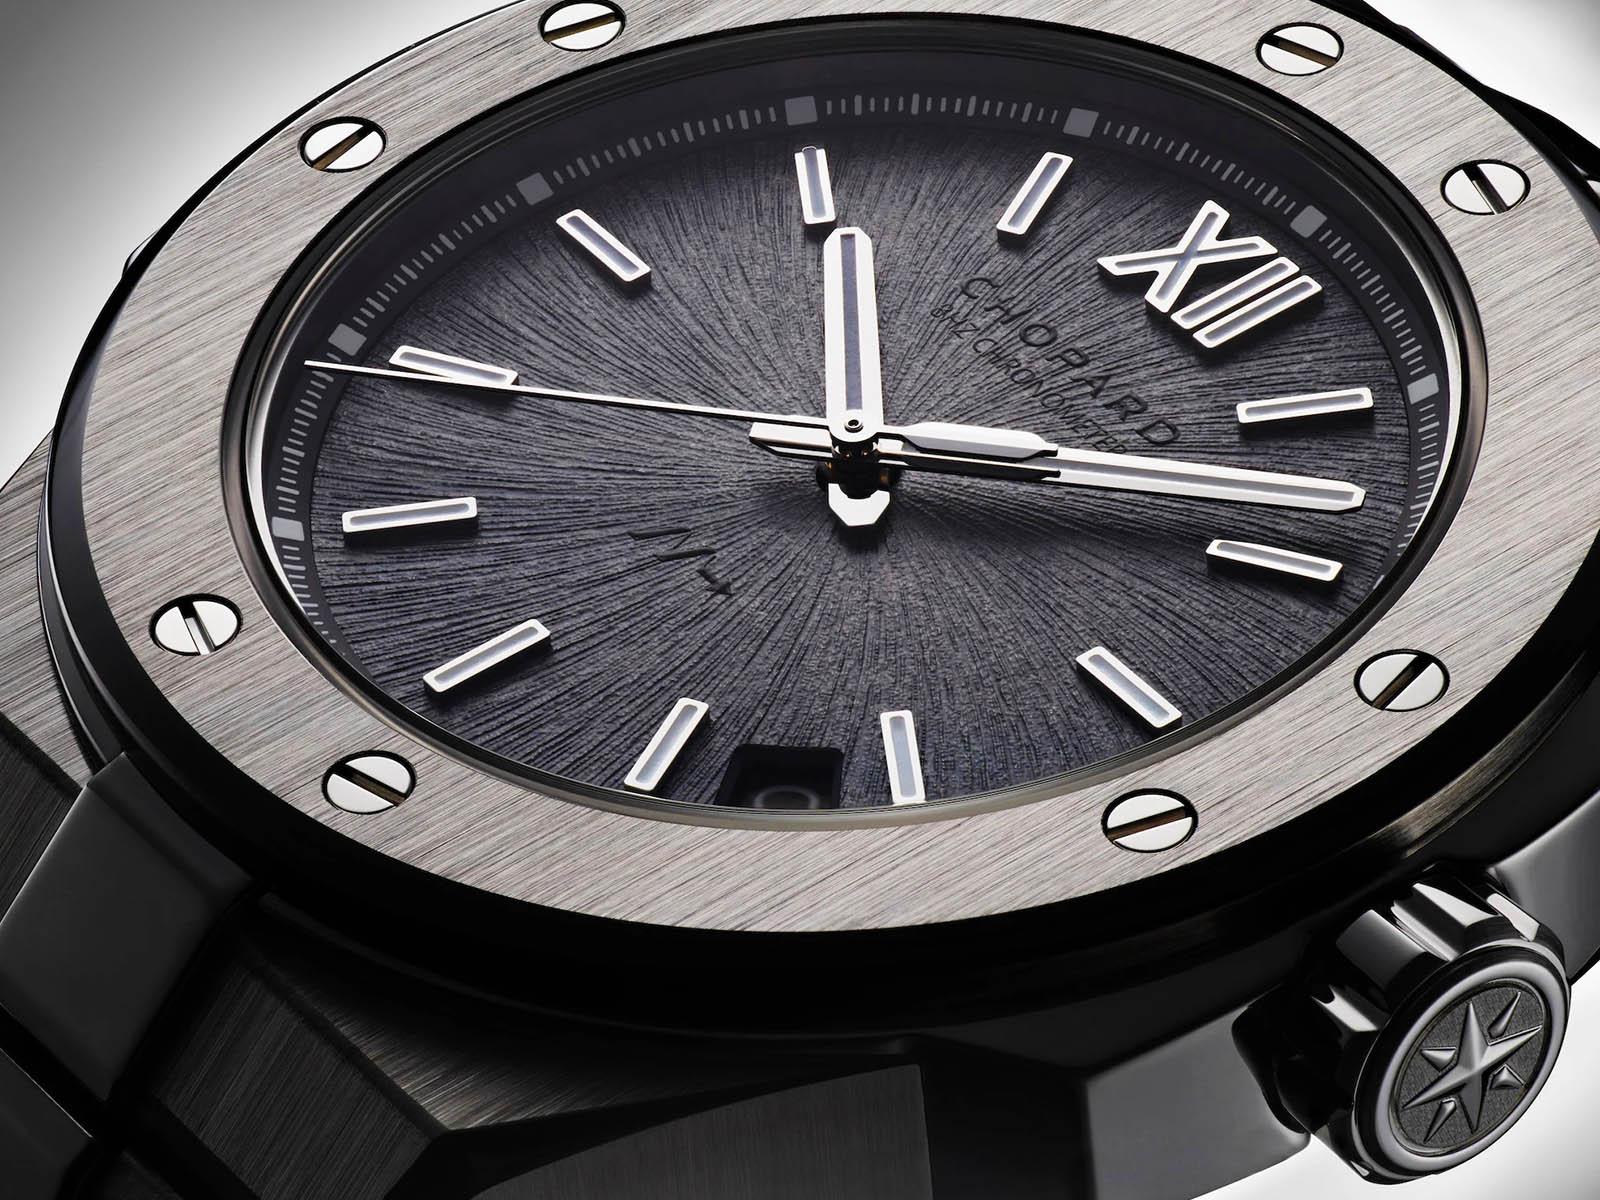 298600-3005-chopard-alpine-eagle-cadence-8hf-titanium-5.jpg